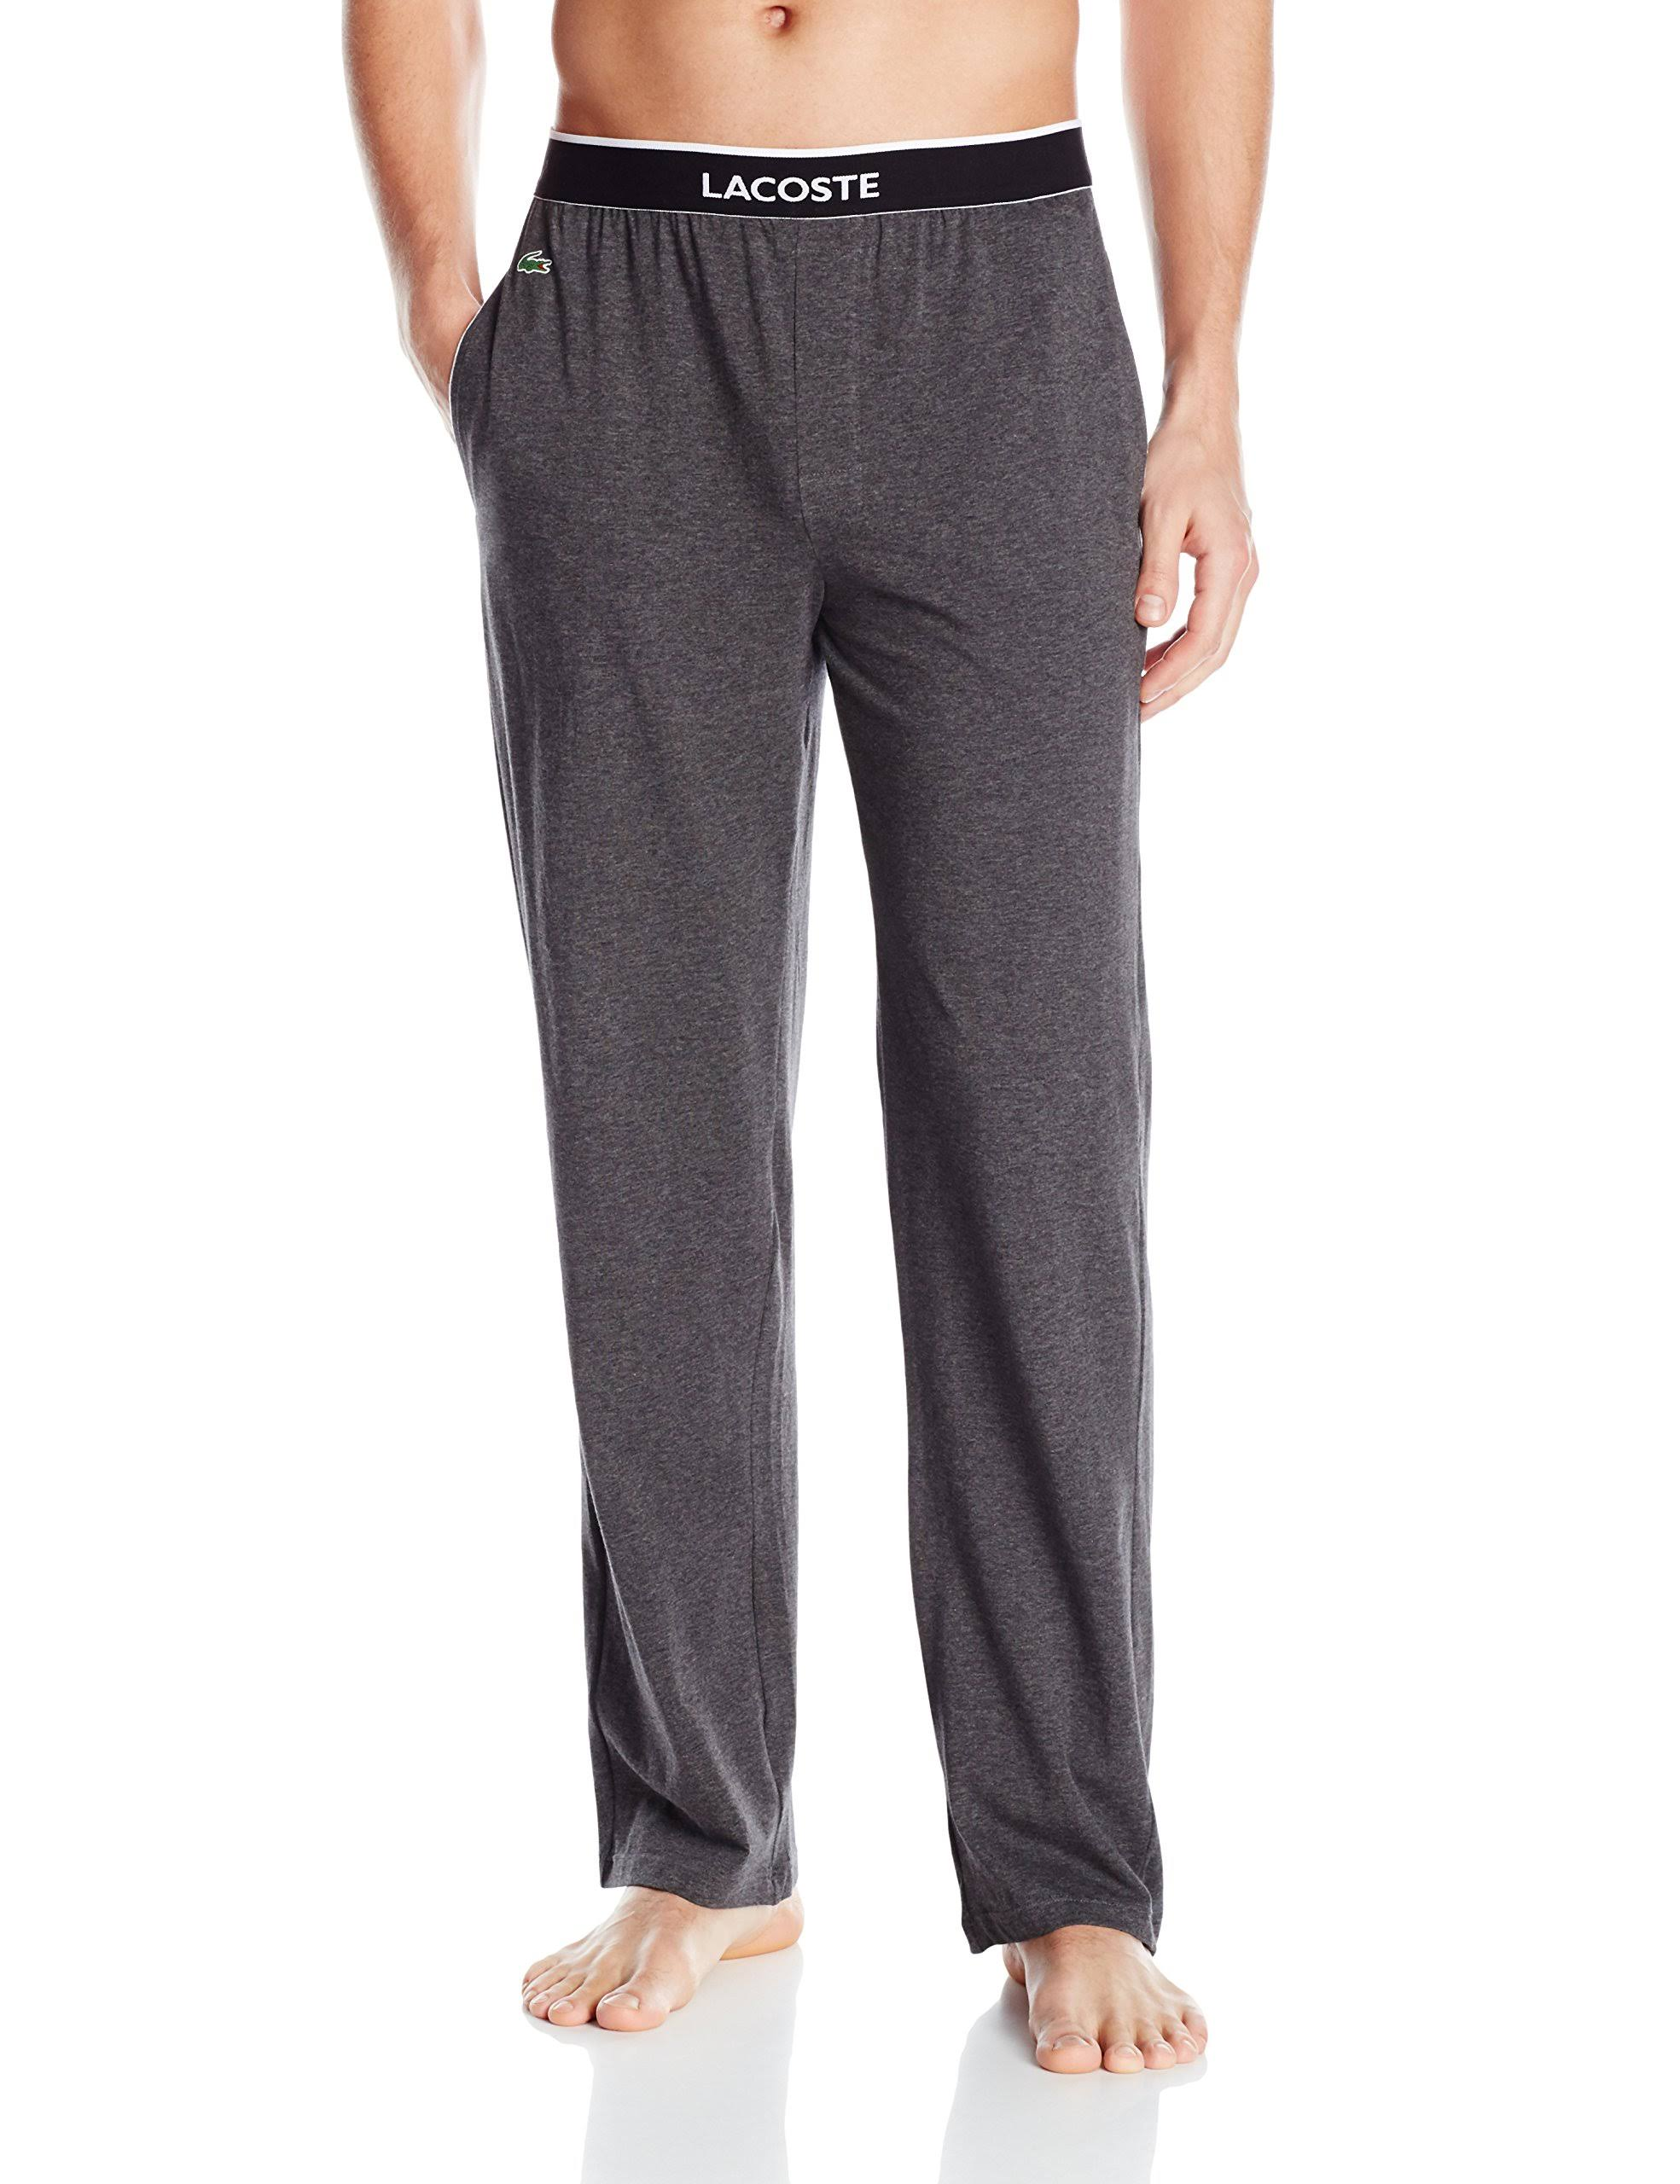 4 Lacoste Hombre Charcoal S Para Euros Pijama Pantalón Solid B0qwWdgX77